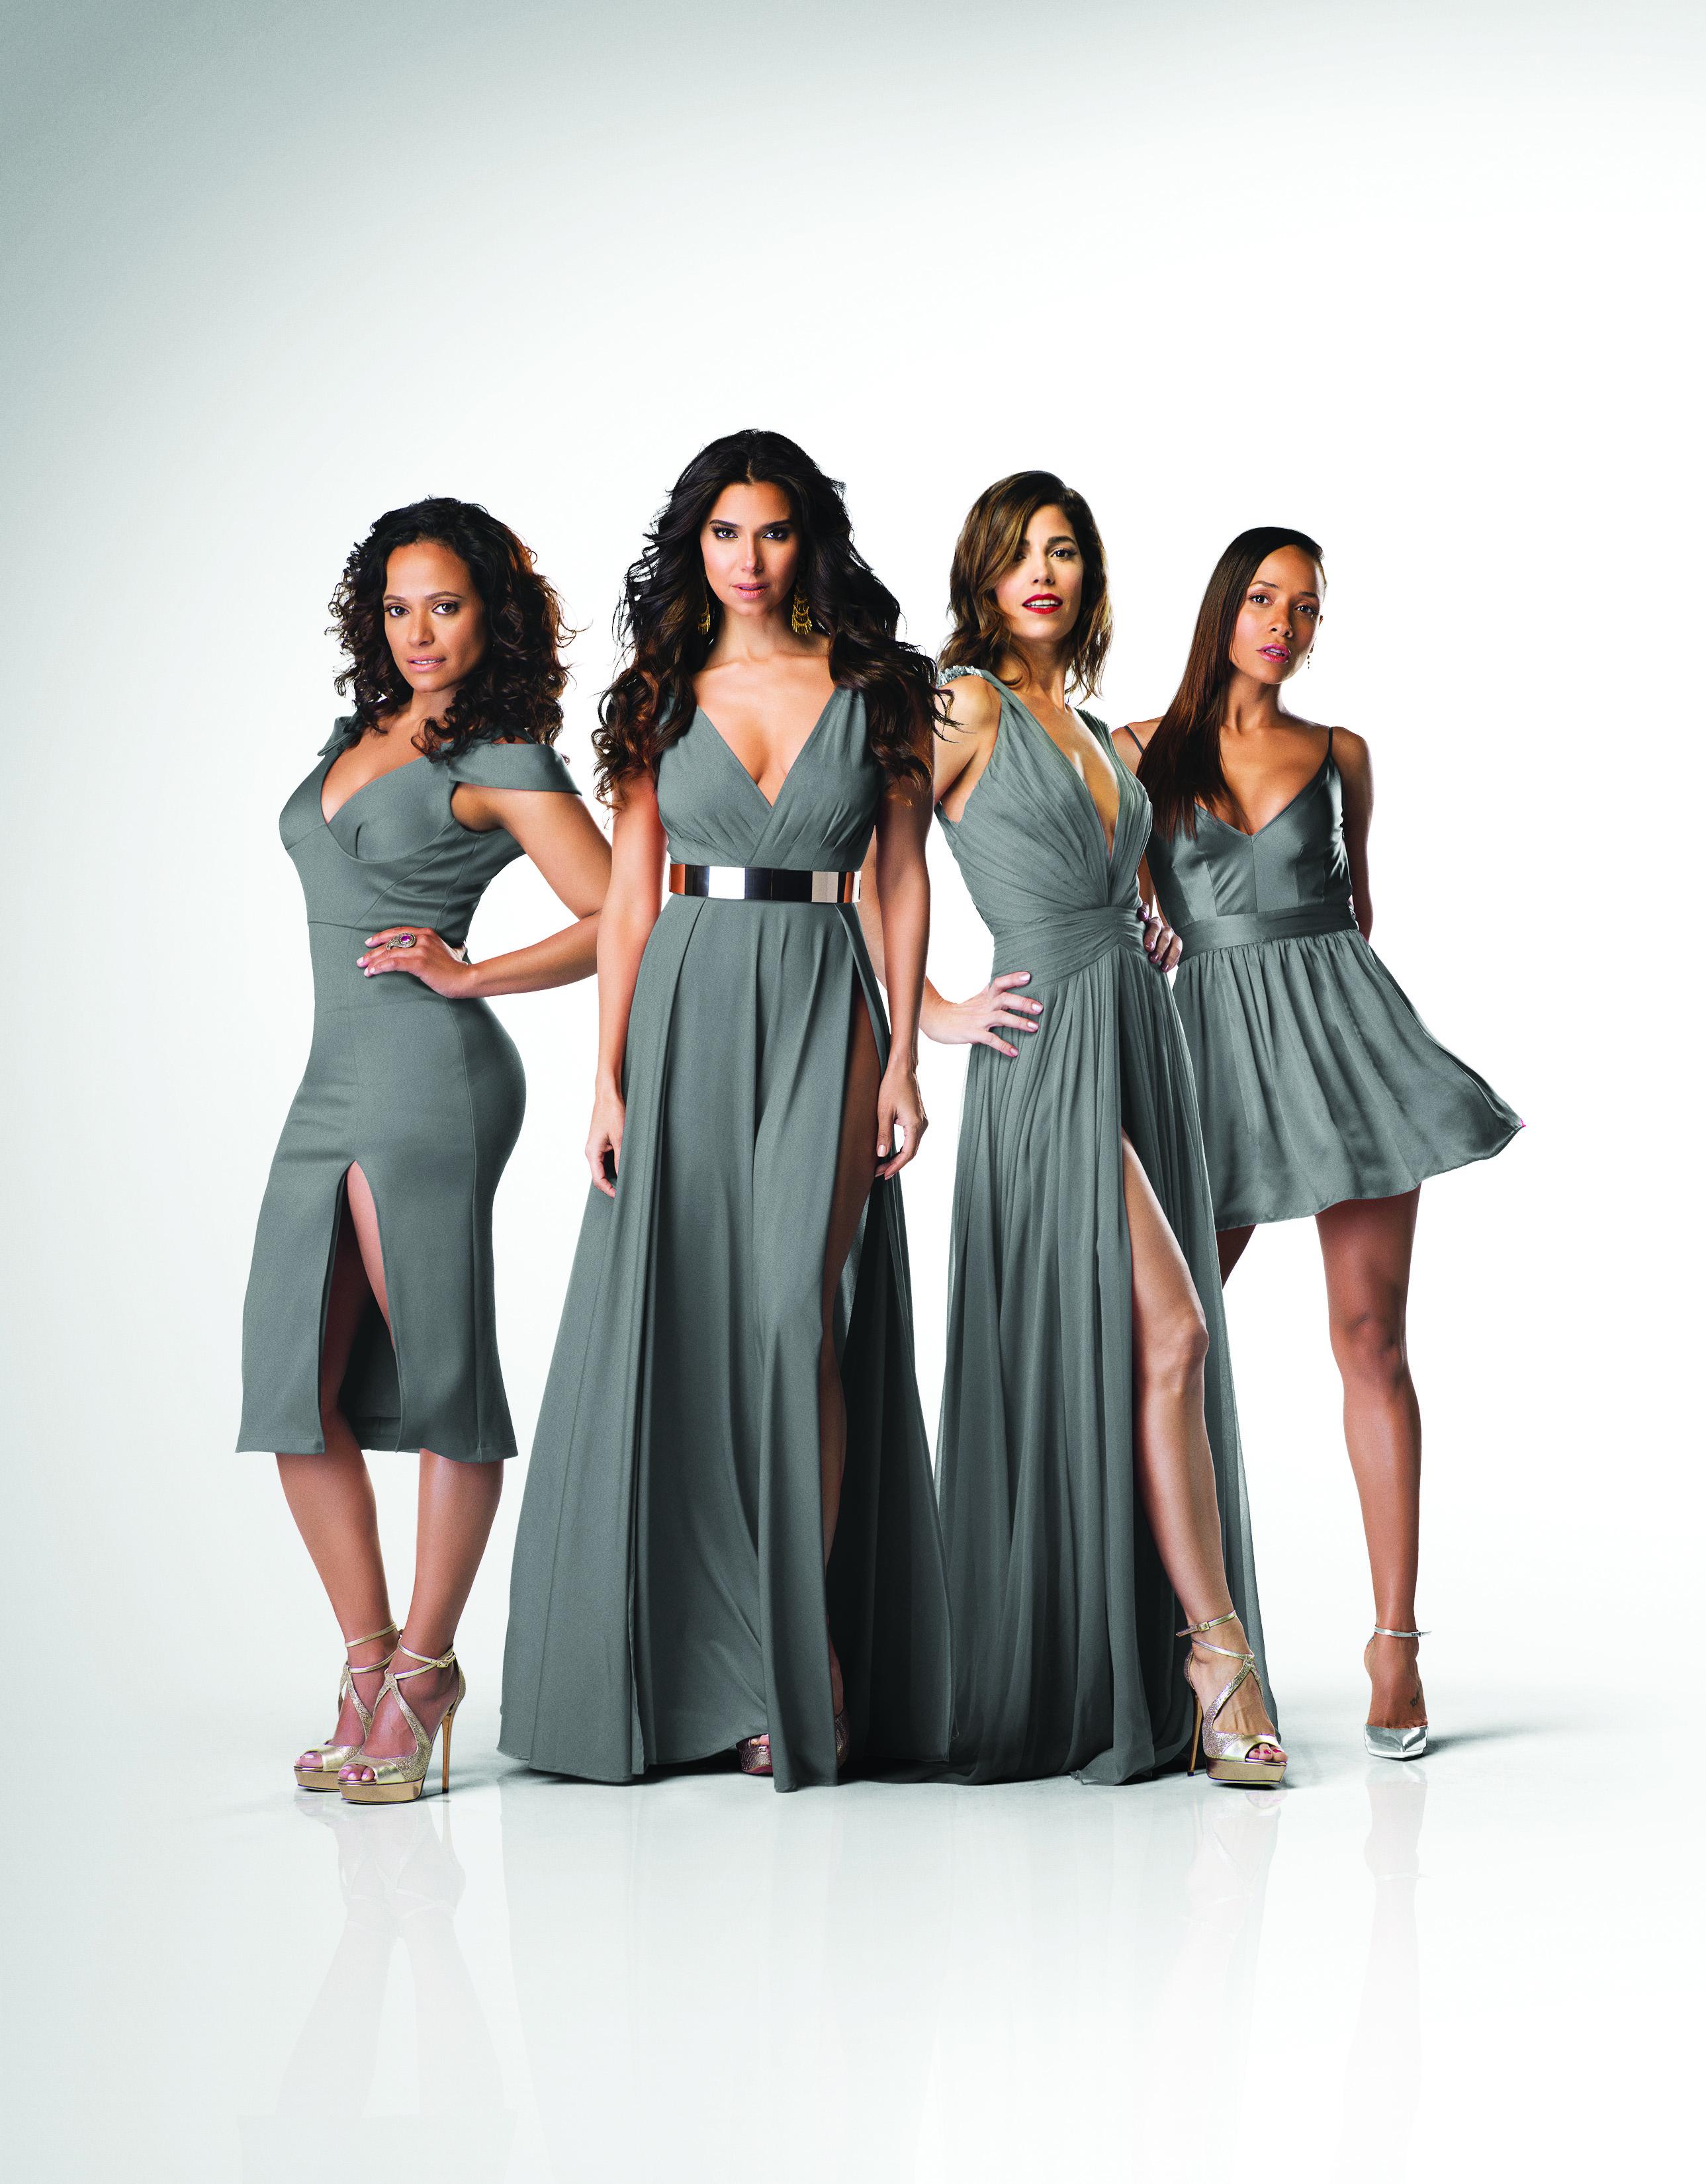 devious maids season 2 episode 6